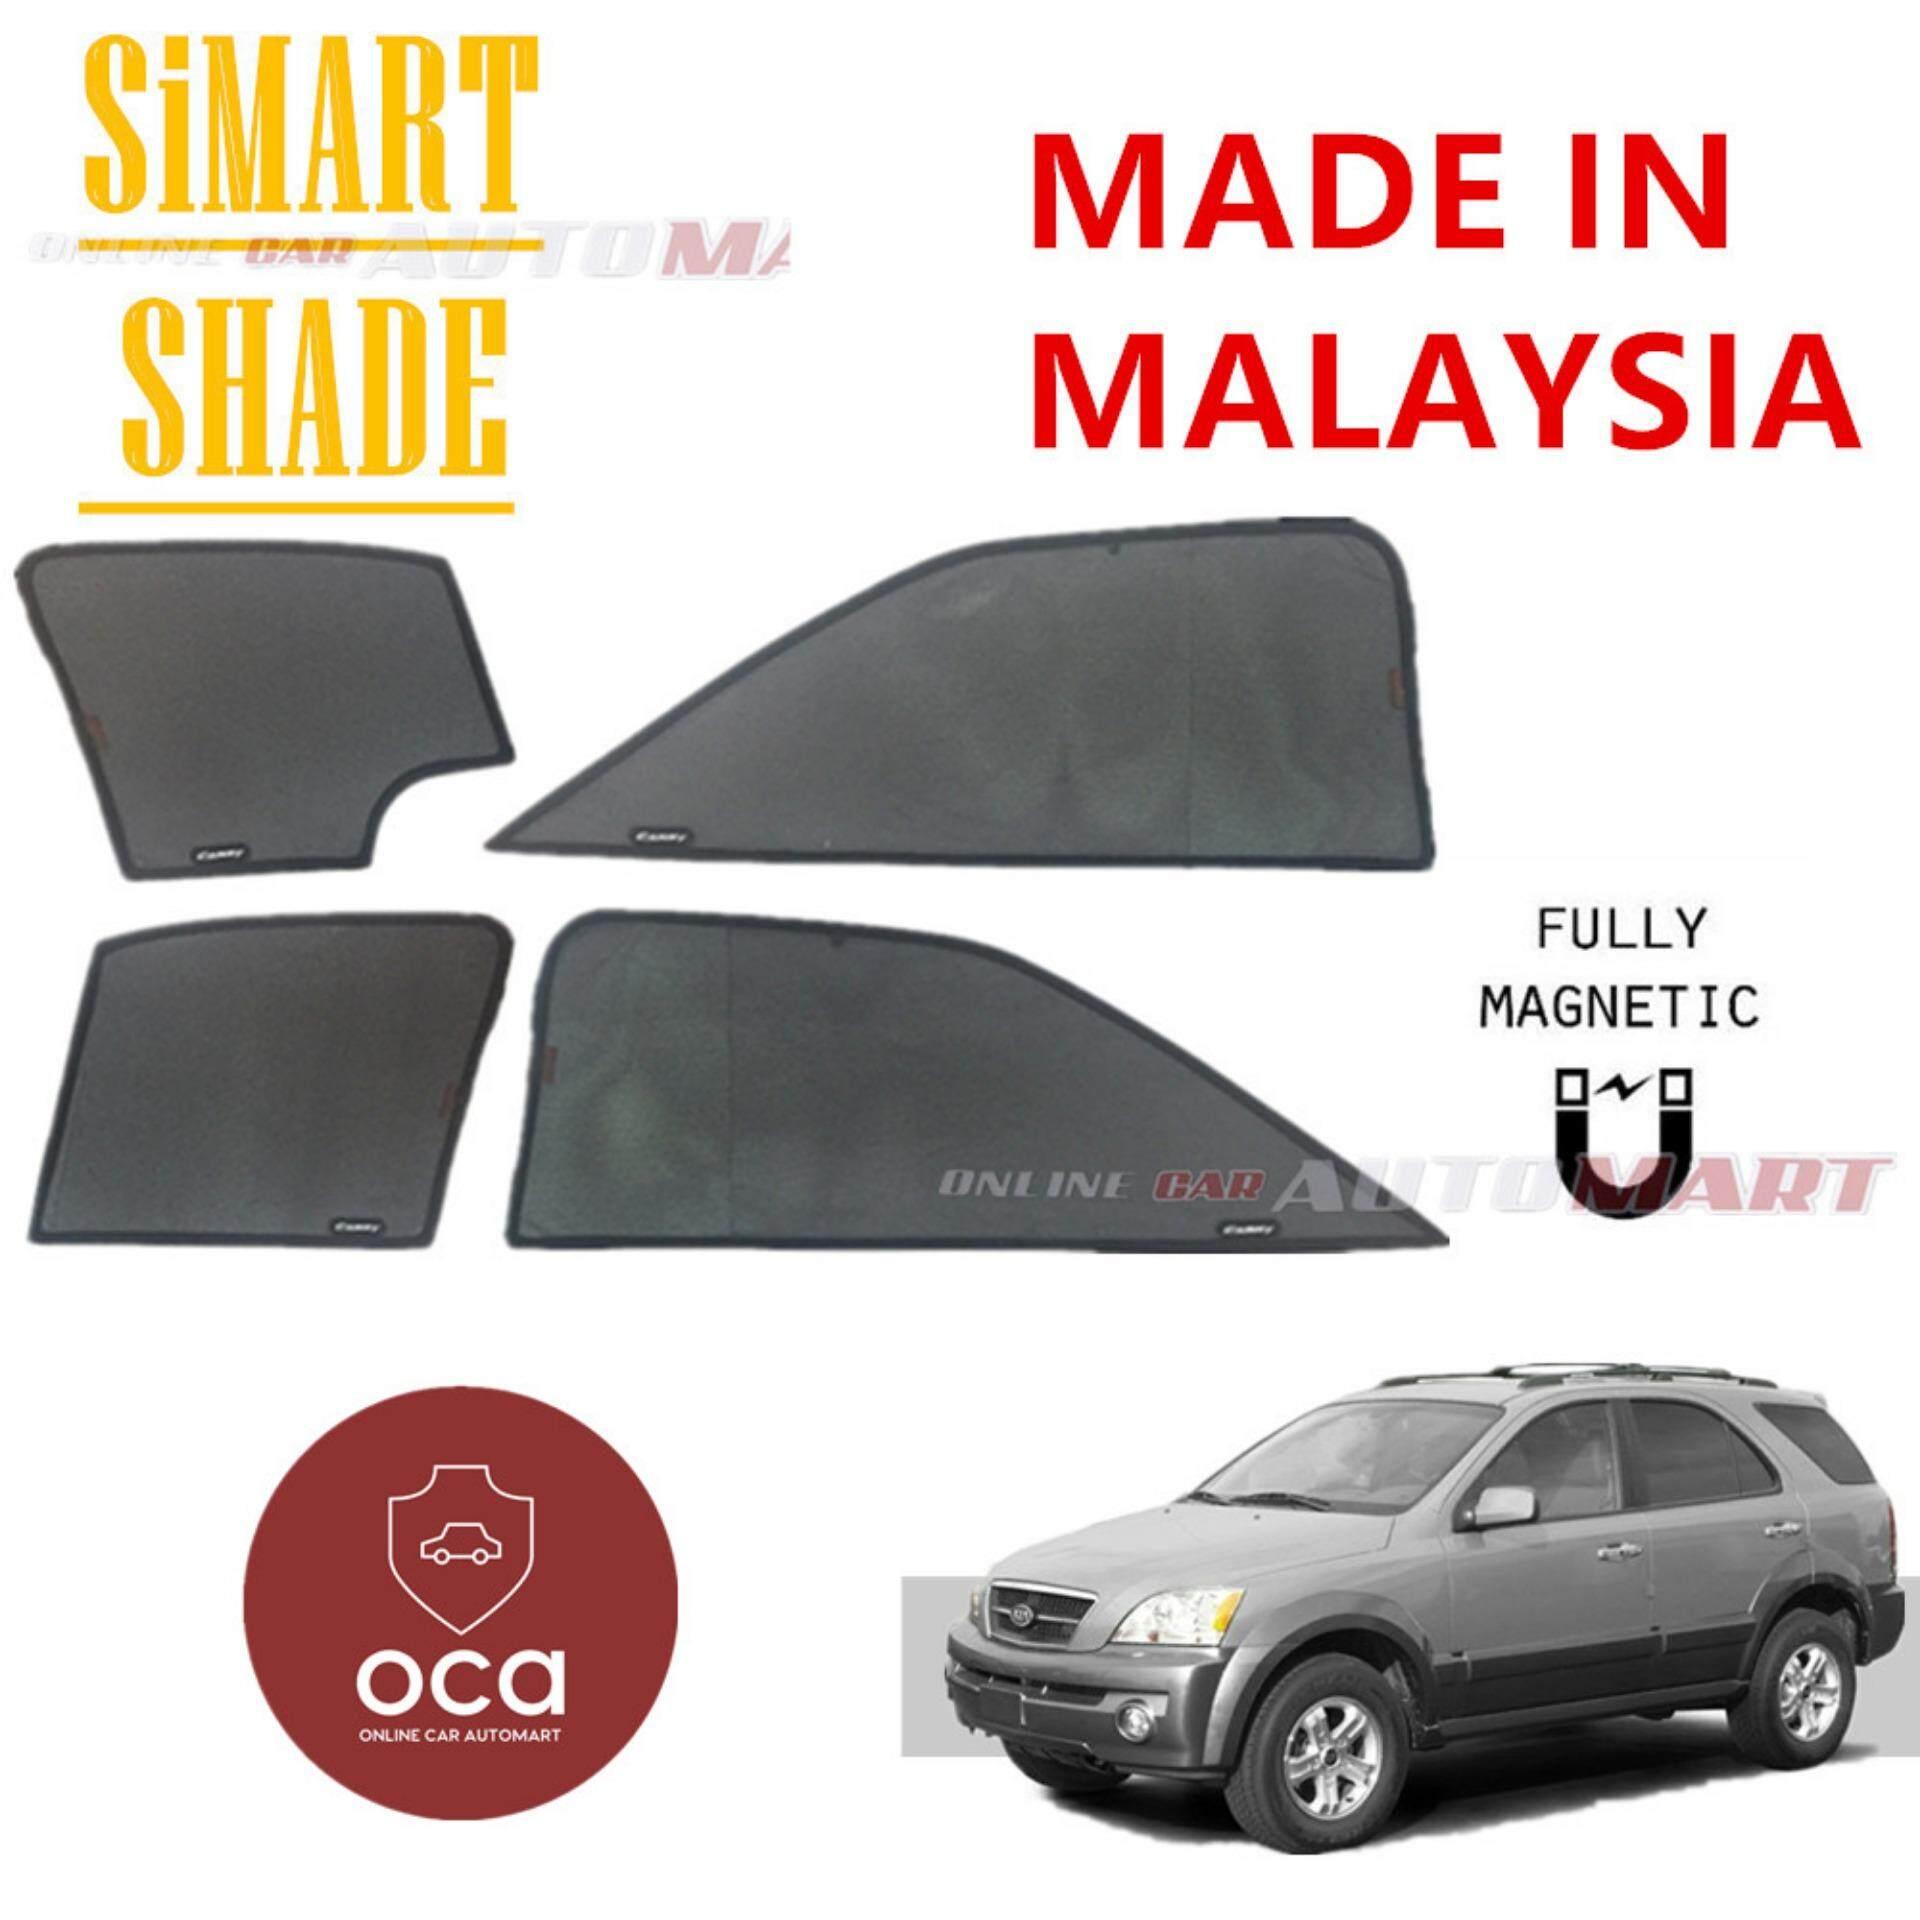 Simart Shade Magnetic Custom Fit OEM Sunshade For Kia Sorento Yr 2002-2009 6pcs (Made In Malaysia)